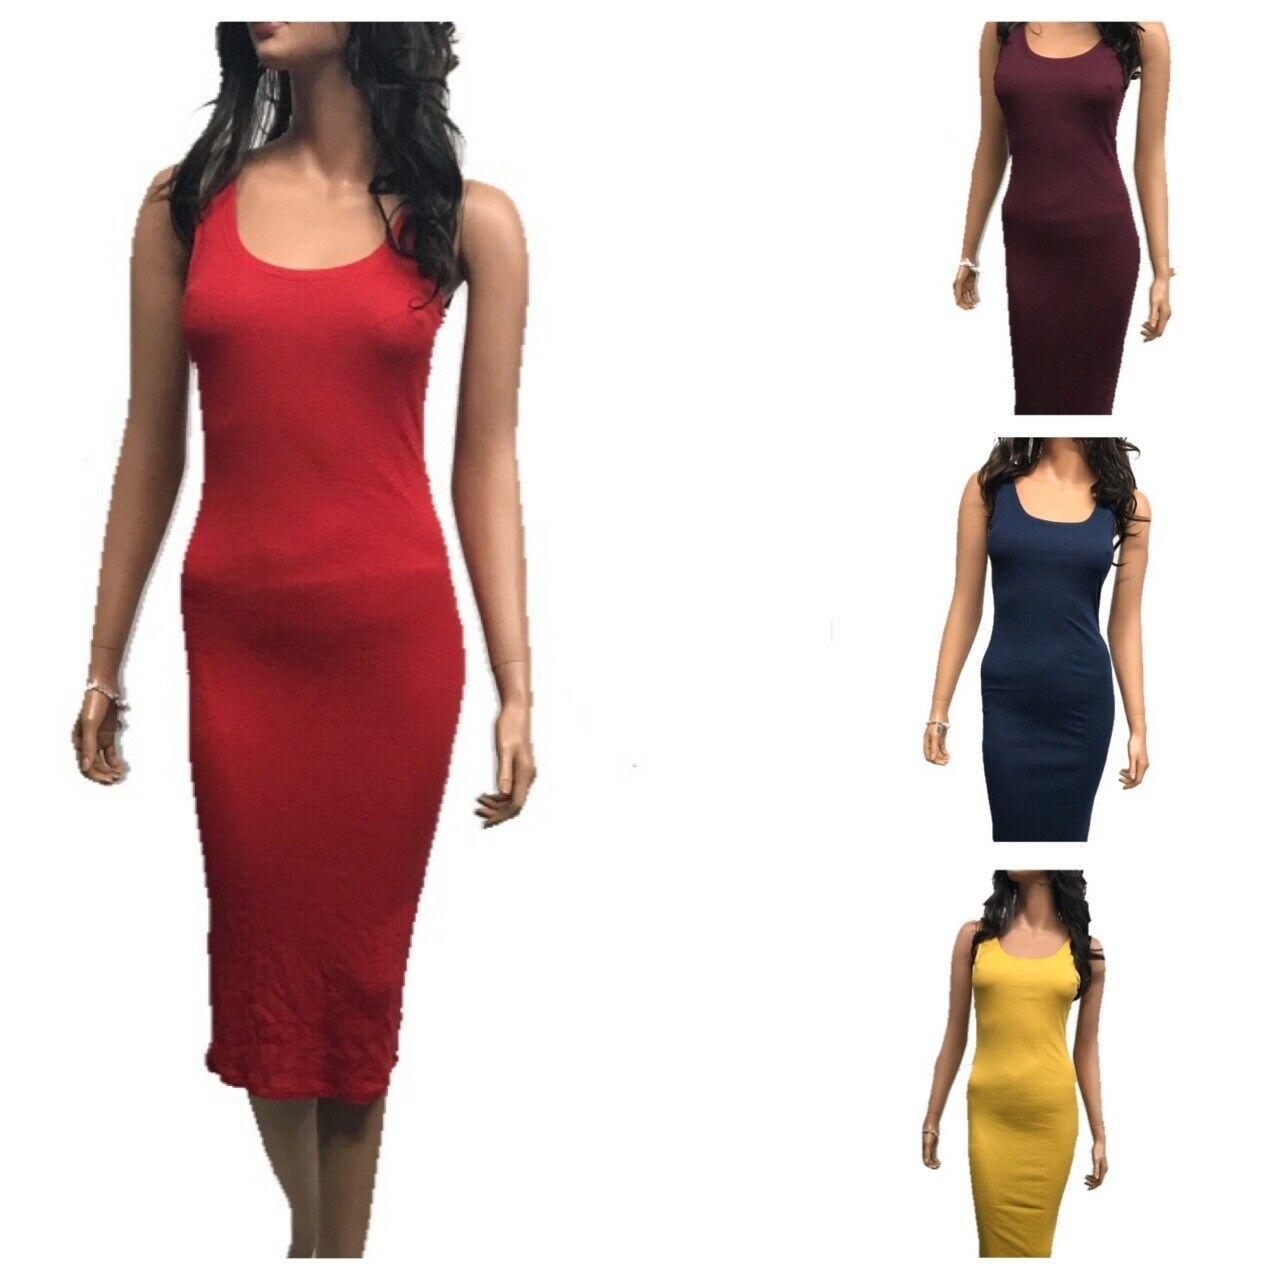 Womens Scoop Neck Sleeveless Ribbed Tank Bodycon Dress S L Bodycon Dress Ideas Of Bodycon Dress Bodycond In 2020 Bodycon Dress Womens Scoop Neck Bodycon Fashion [ 1280 x 1280 Pixel ]